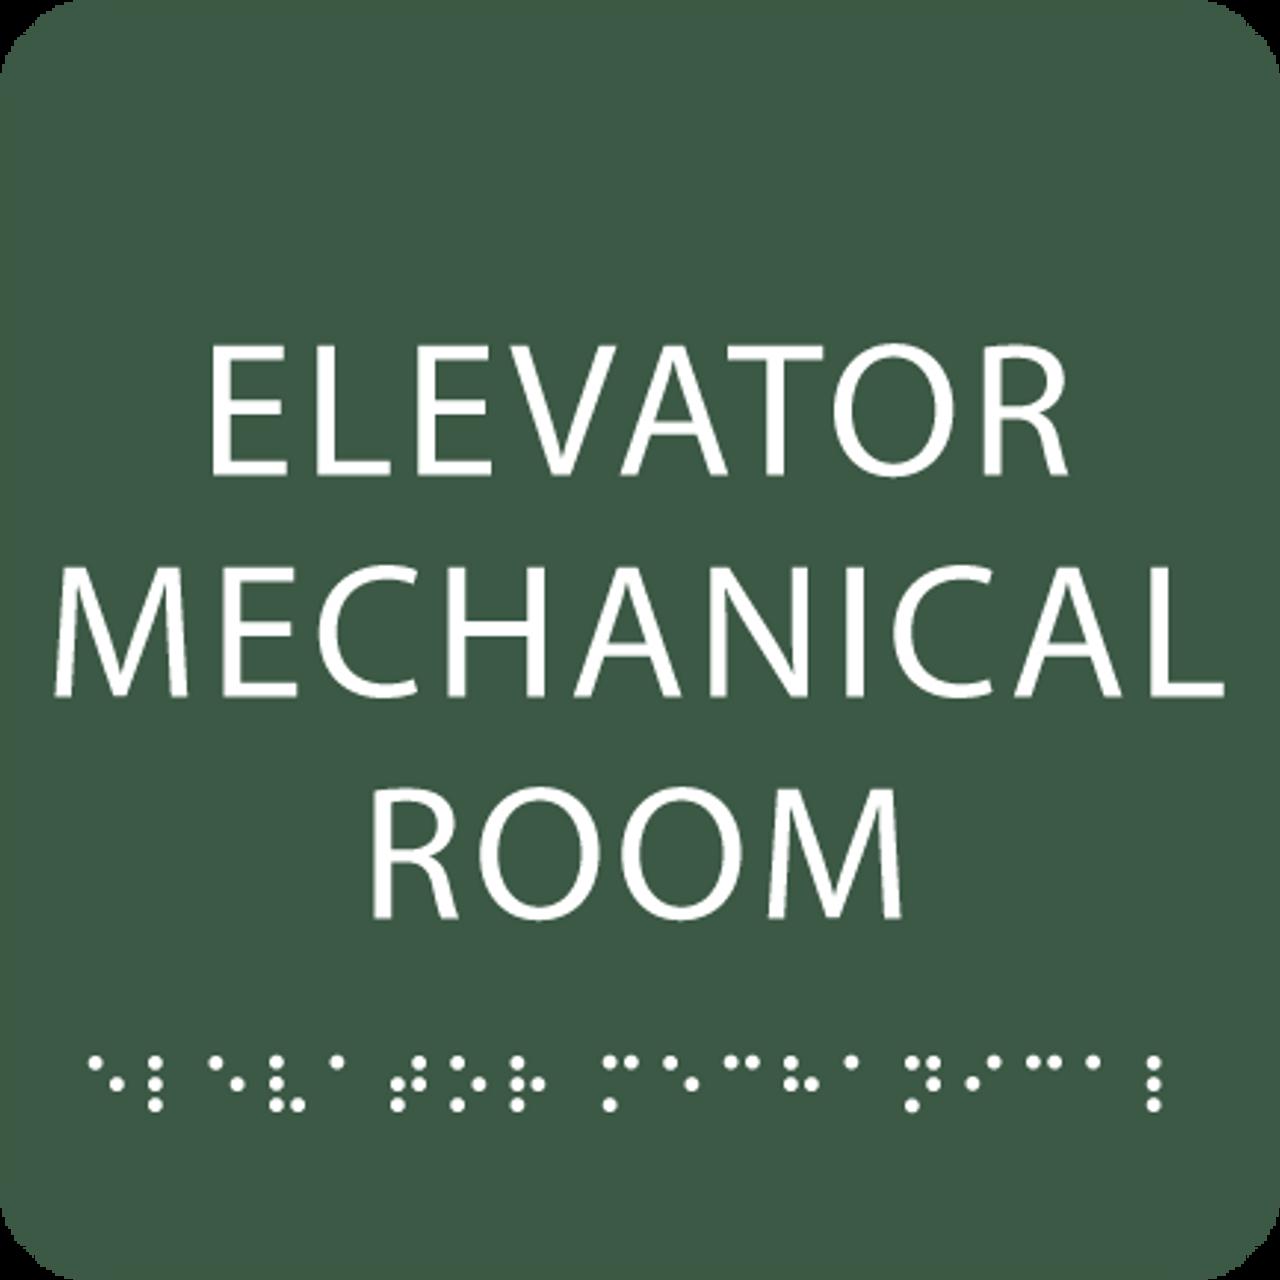 Green Elevator Mechanical Room Tactile Sign